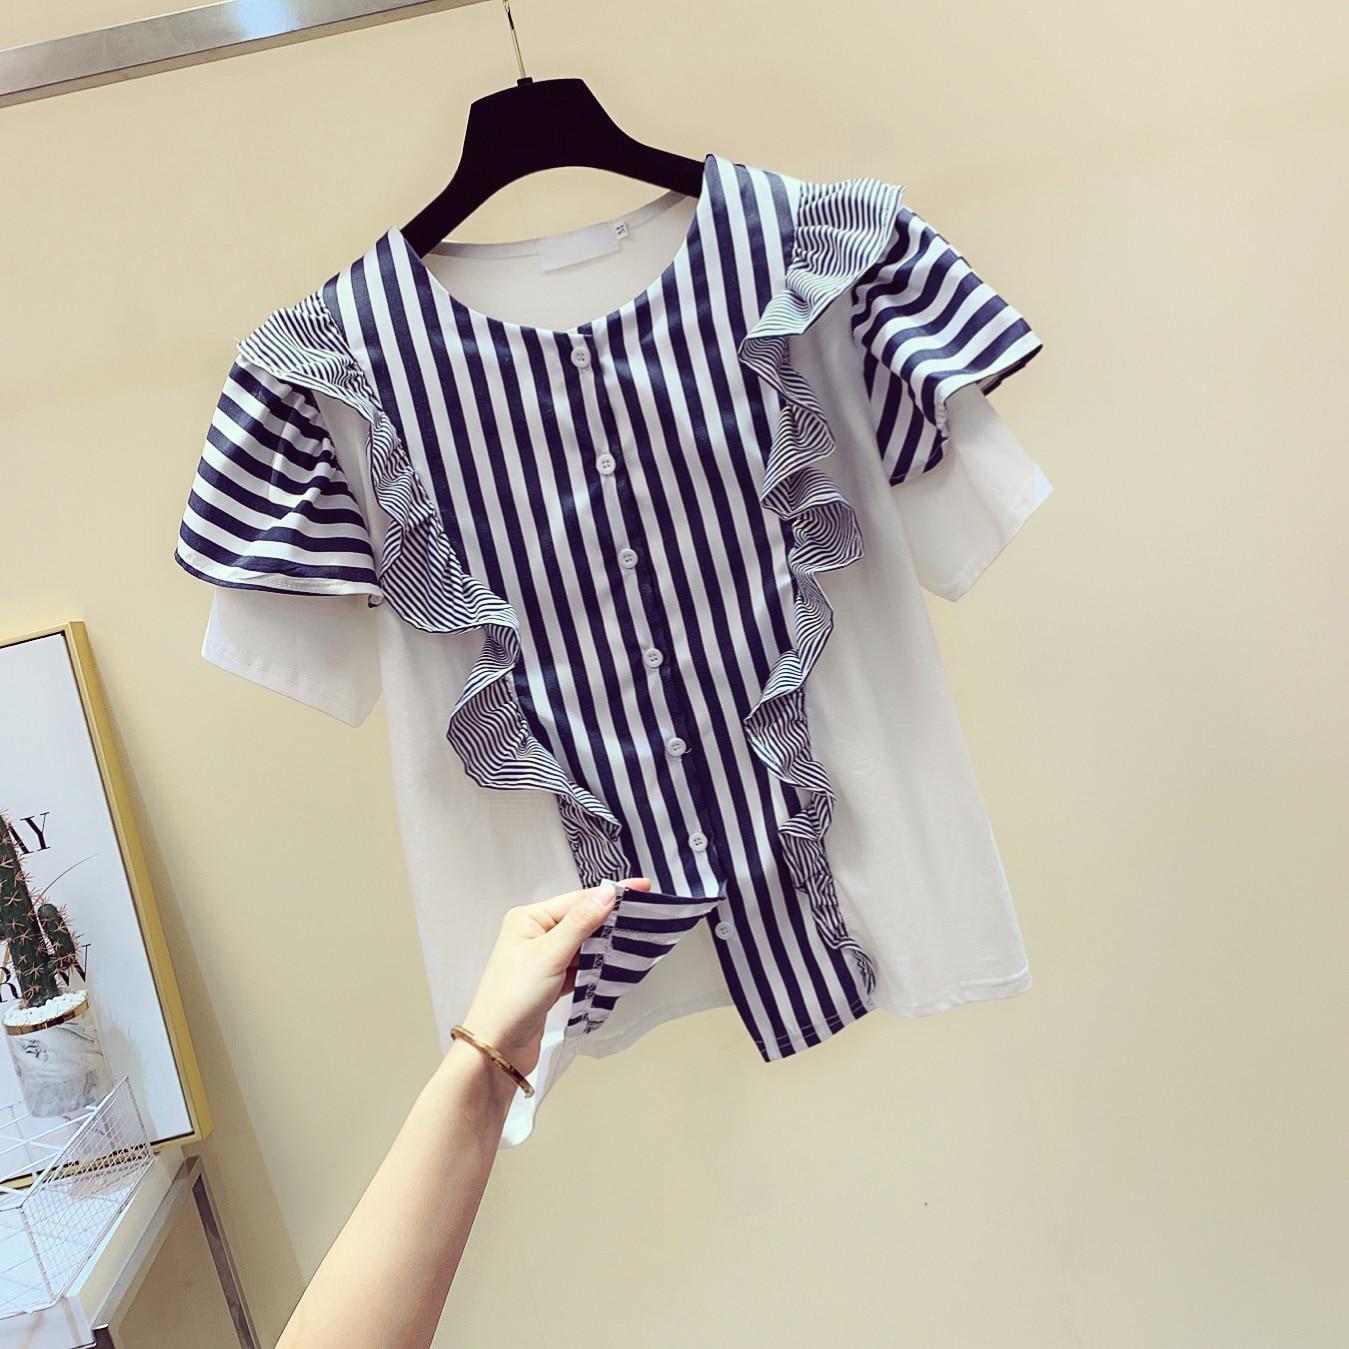 2020 Summer New Vertical Striped Panel Shirt Women's Loose-Fit Short-Sleeve Ruffle Blouse Women's Tops Blusas Femme Blusa Mujer